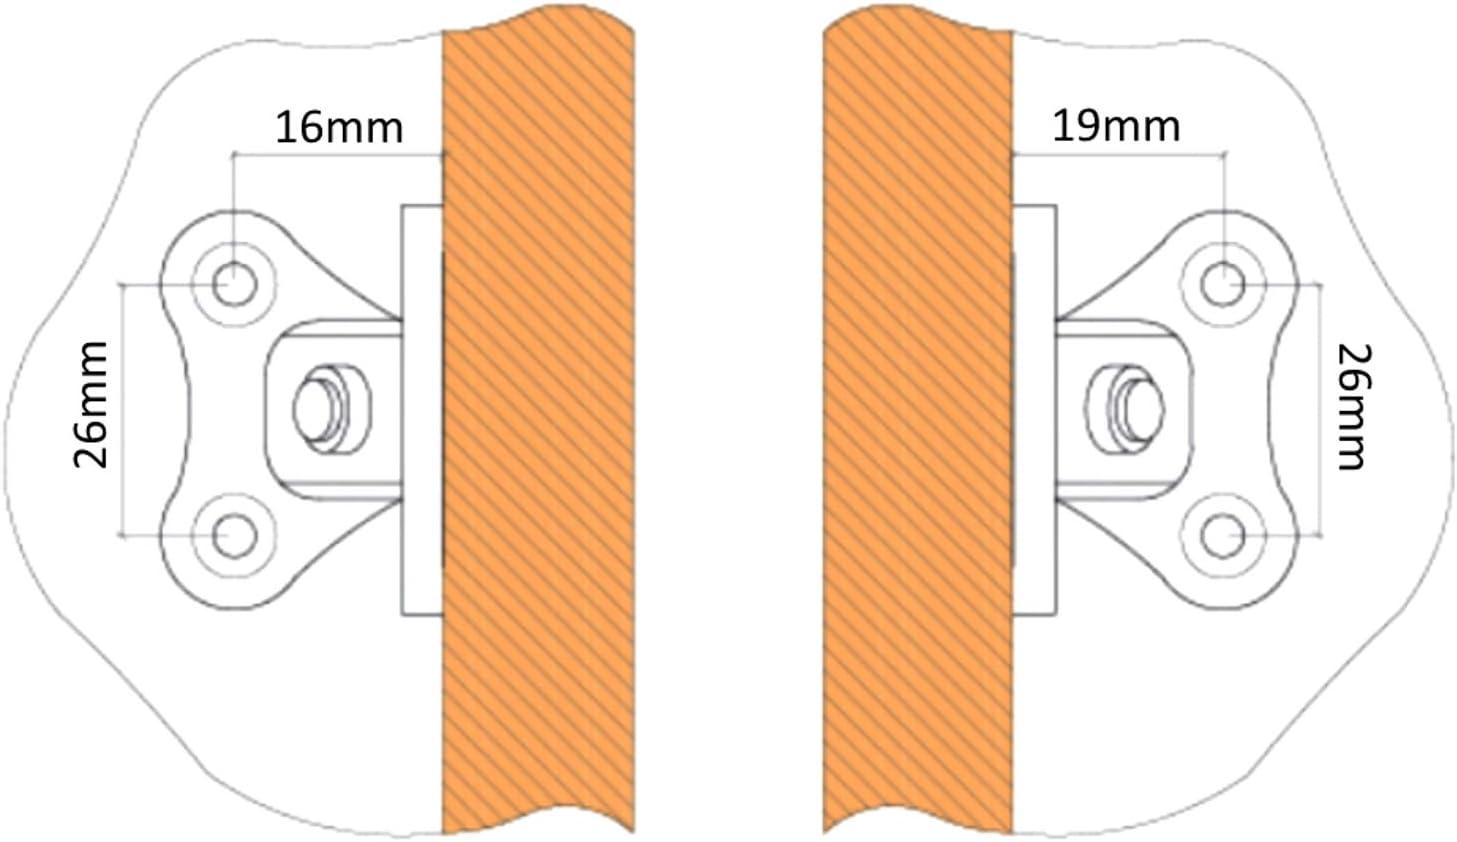 10 Escuadras de /ángulo racor refuerzo pl/ástico para ensamblaje de muebles panel C41530 AERZETIX